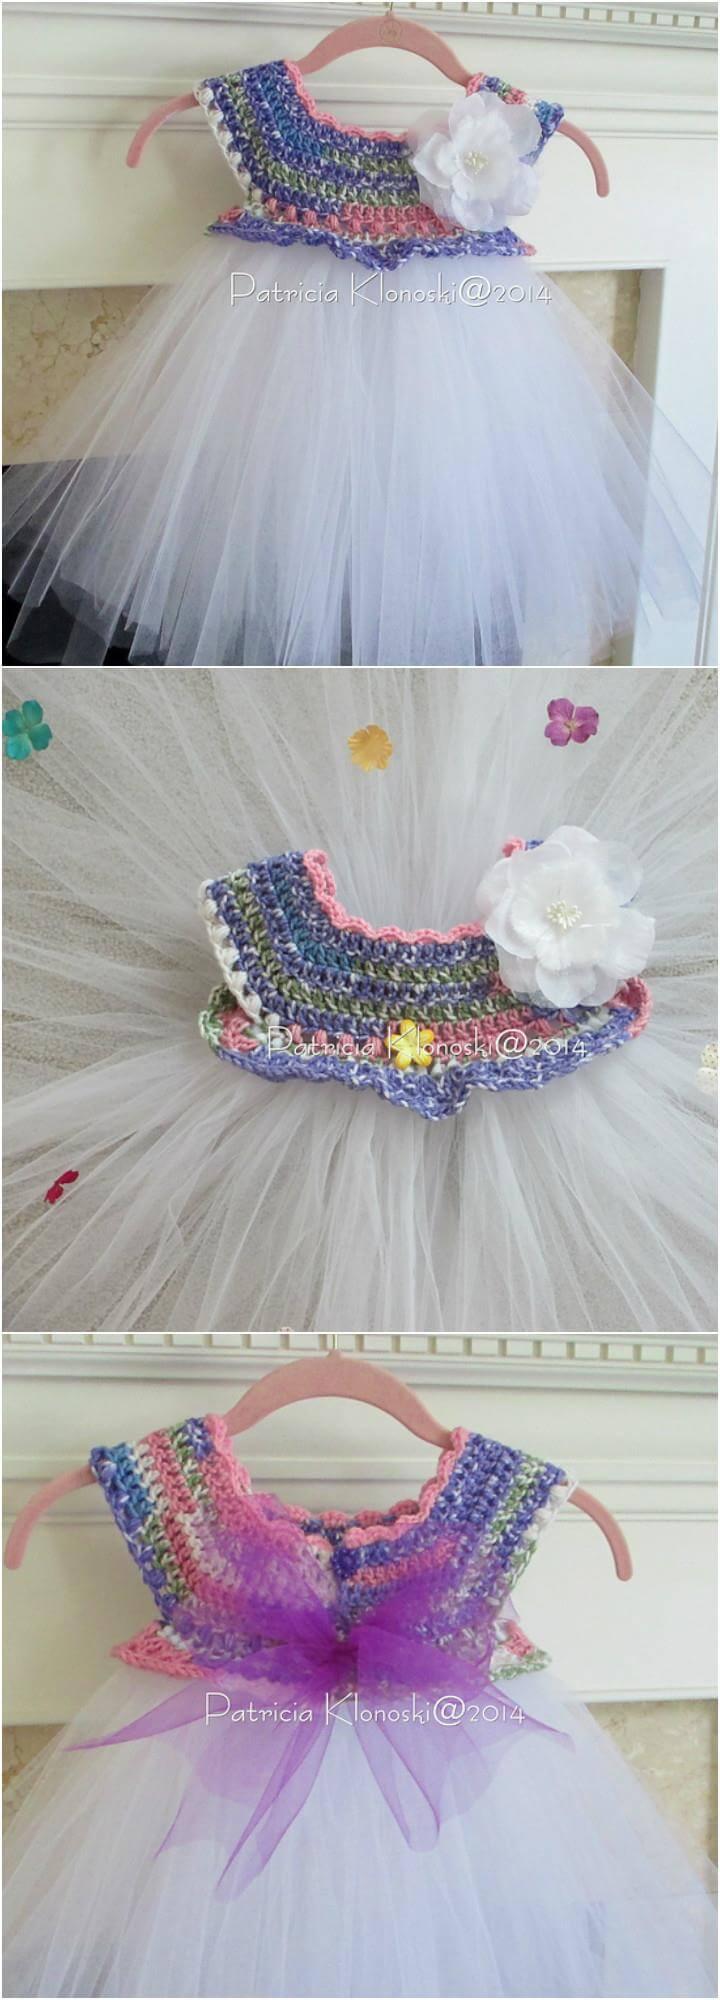 Crochet Baby Tutu Dress Pattern : 10 Free Crochet Patterns for Girl Tutu Dress Top 101 Crochet